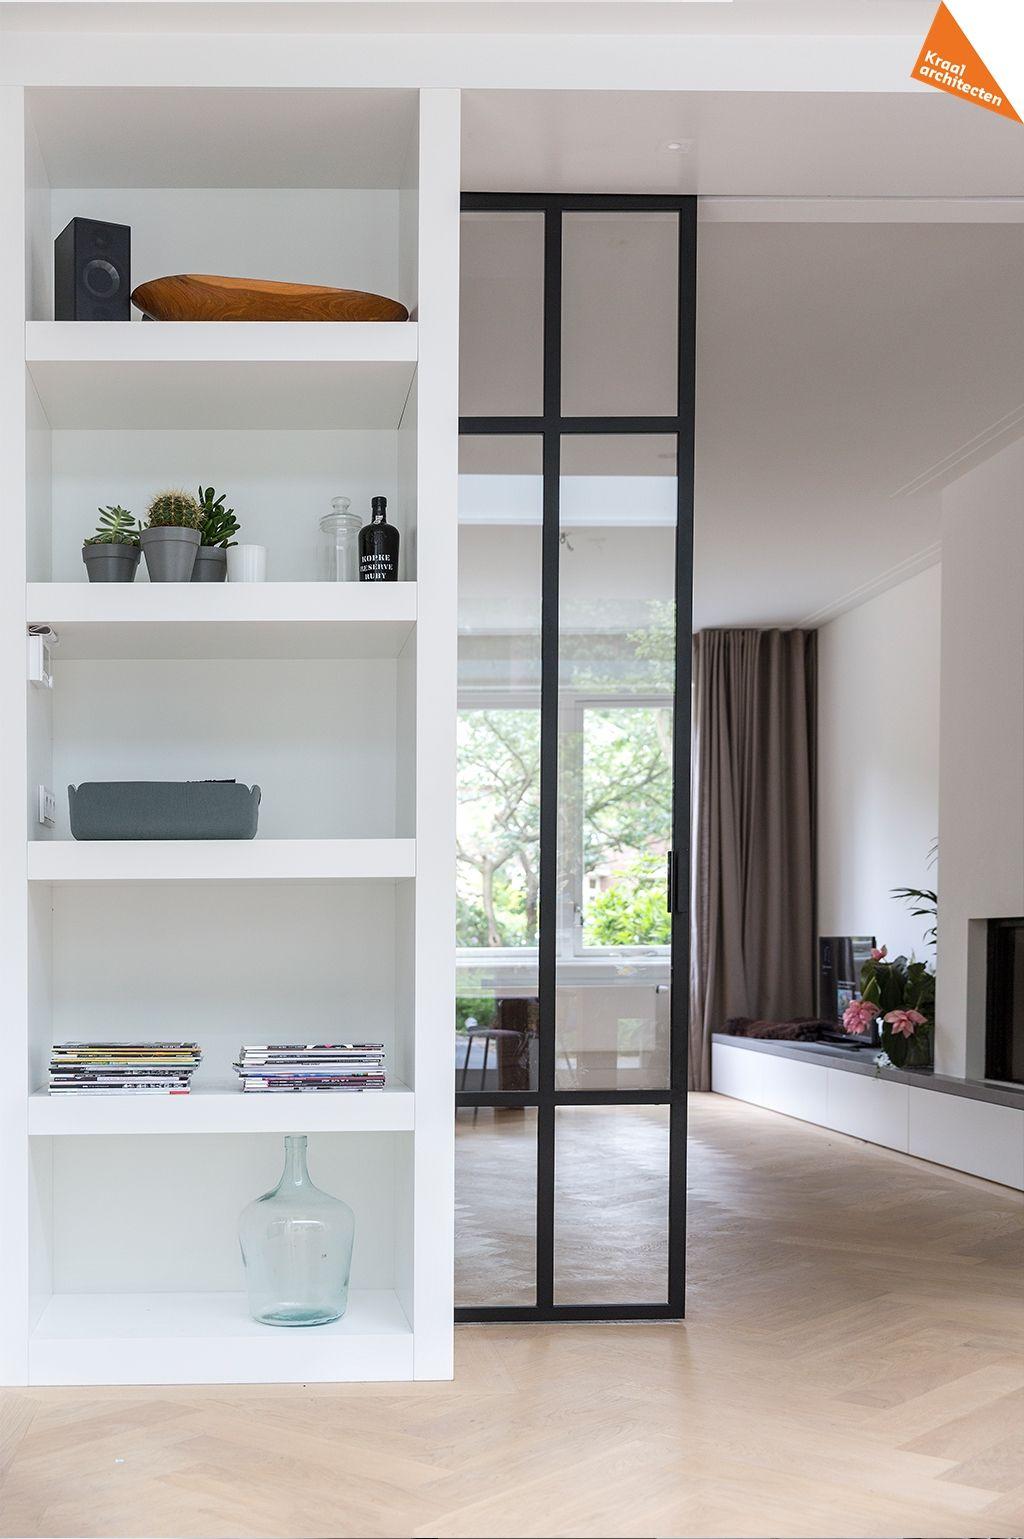 Kast in nis woonkamer - Woonkamer | Pinterest - Architecten ...